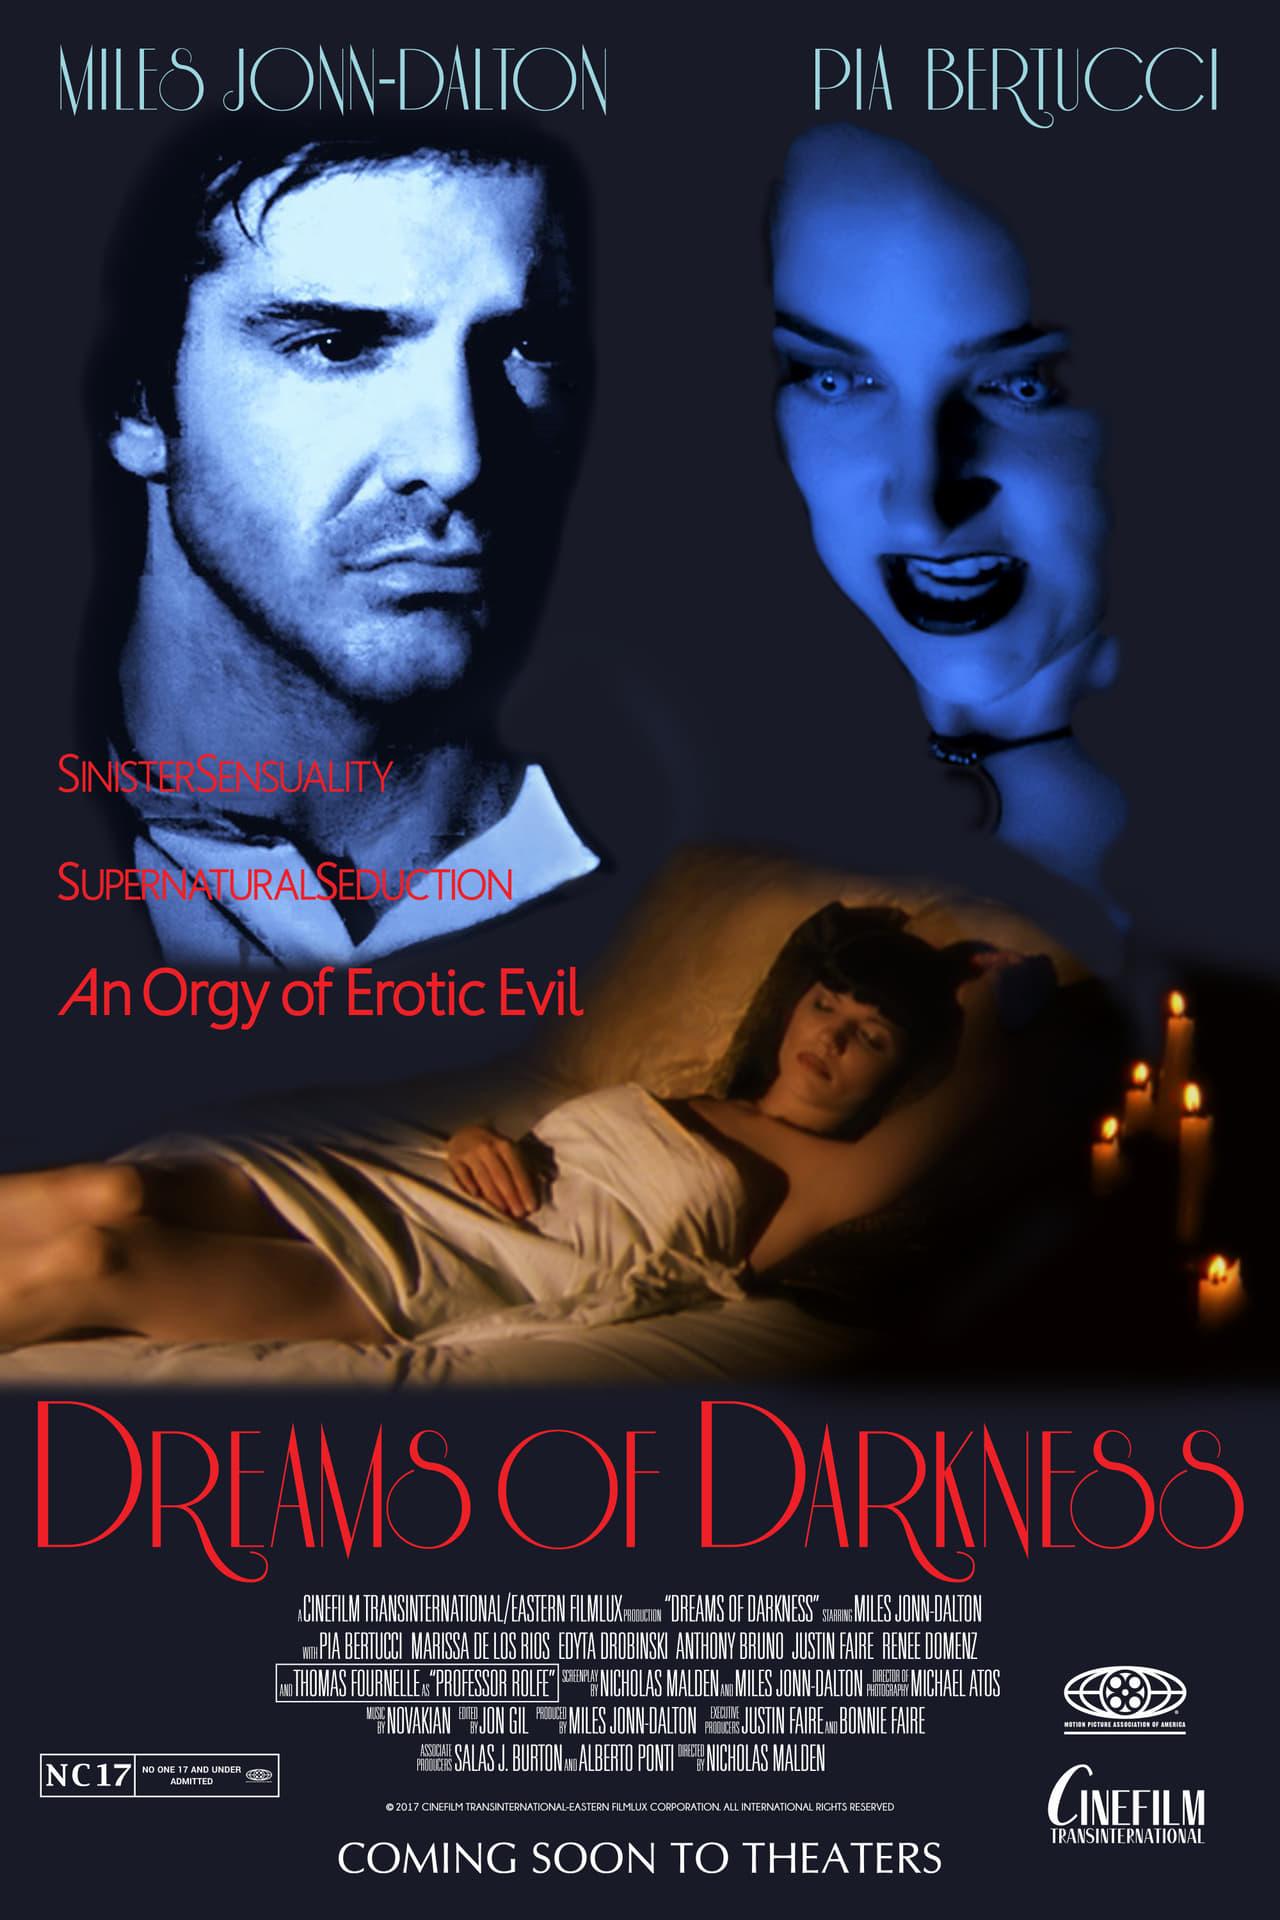 Dreams of Darkness